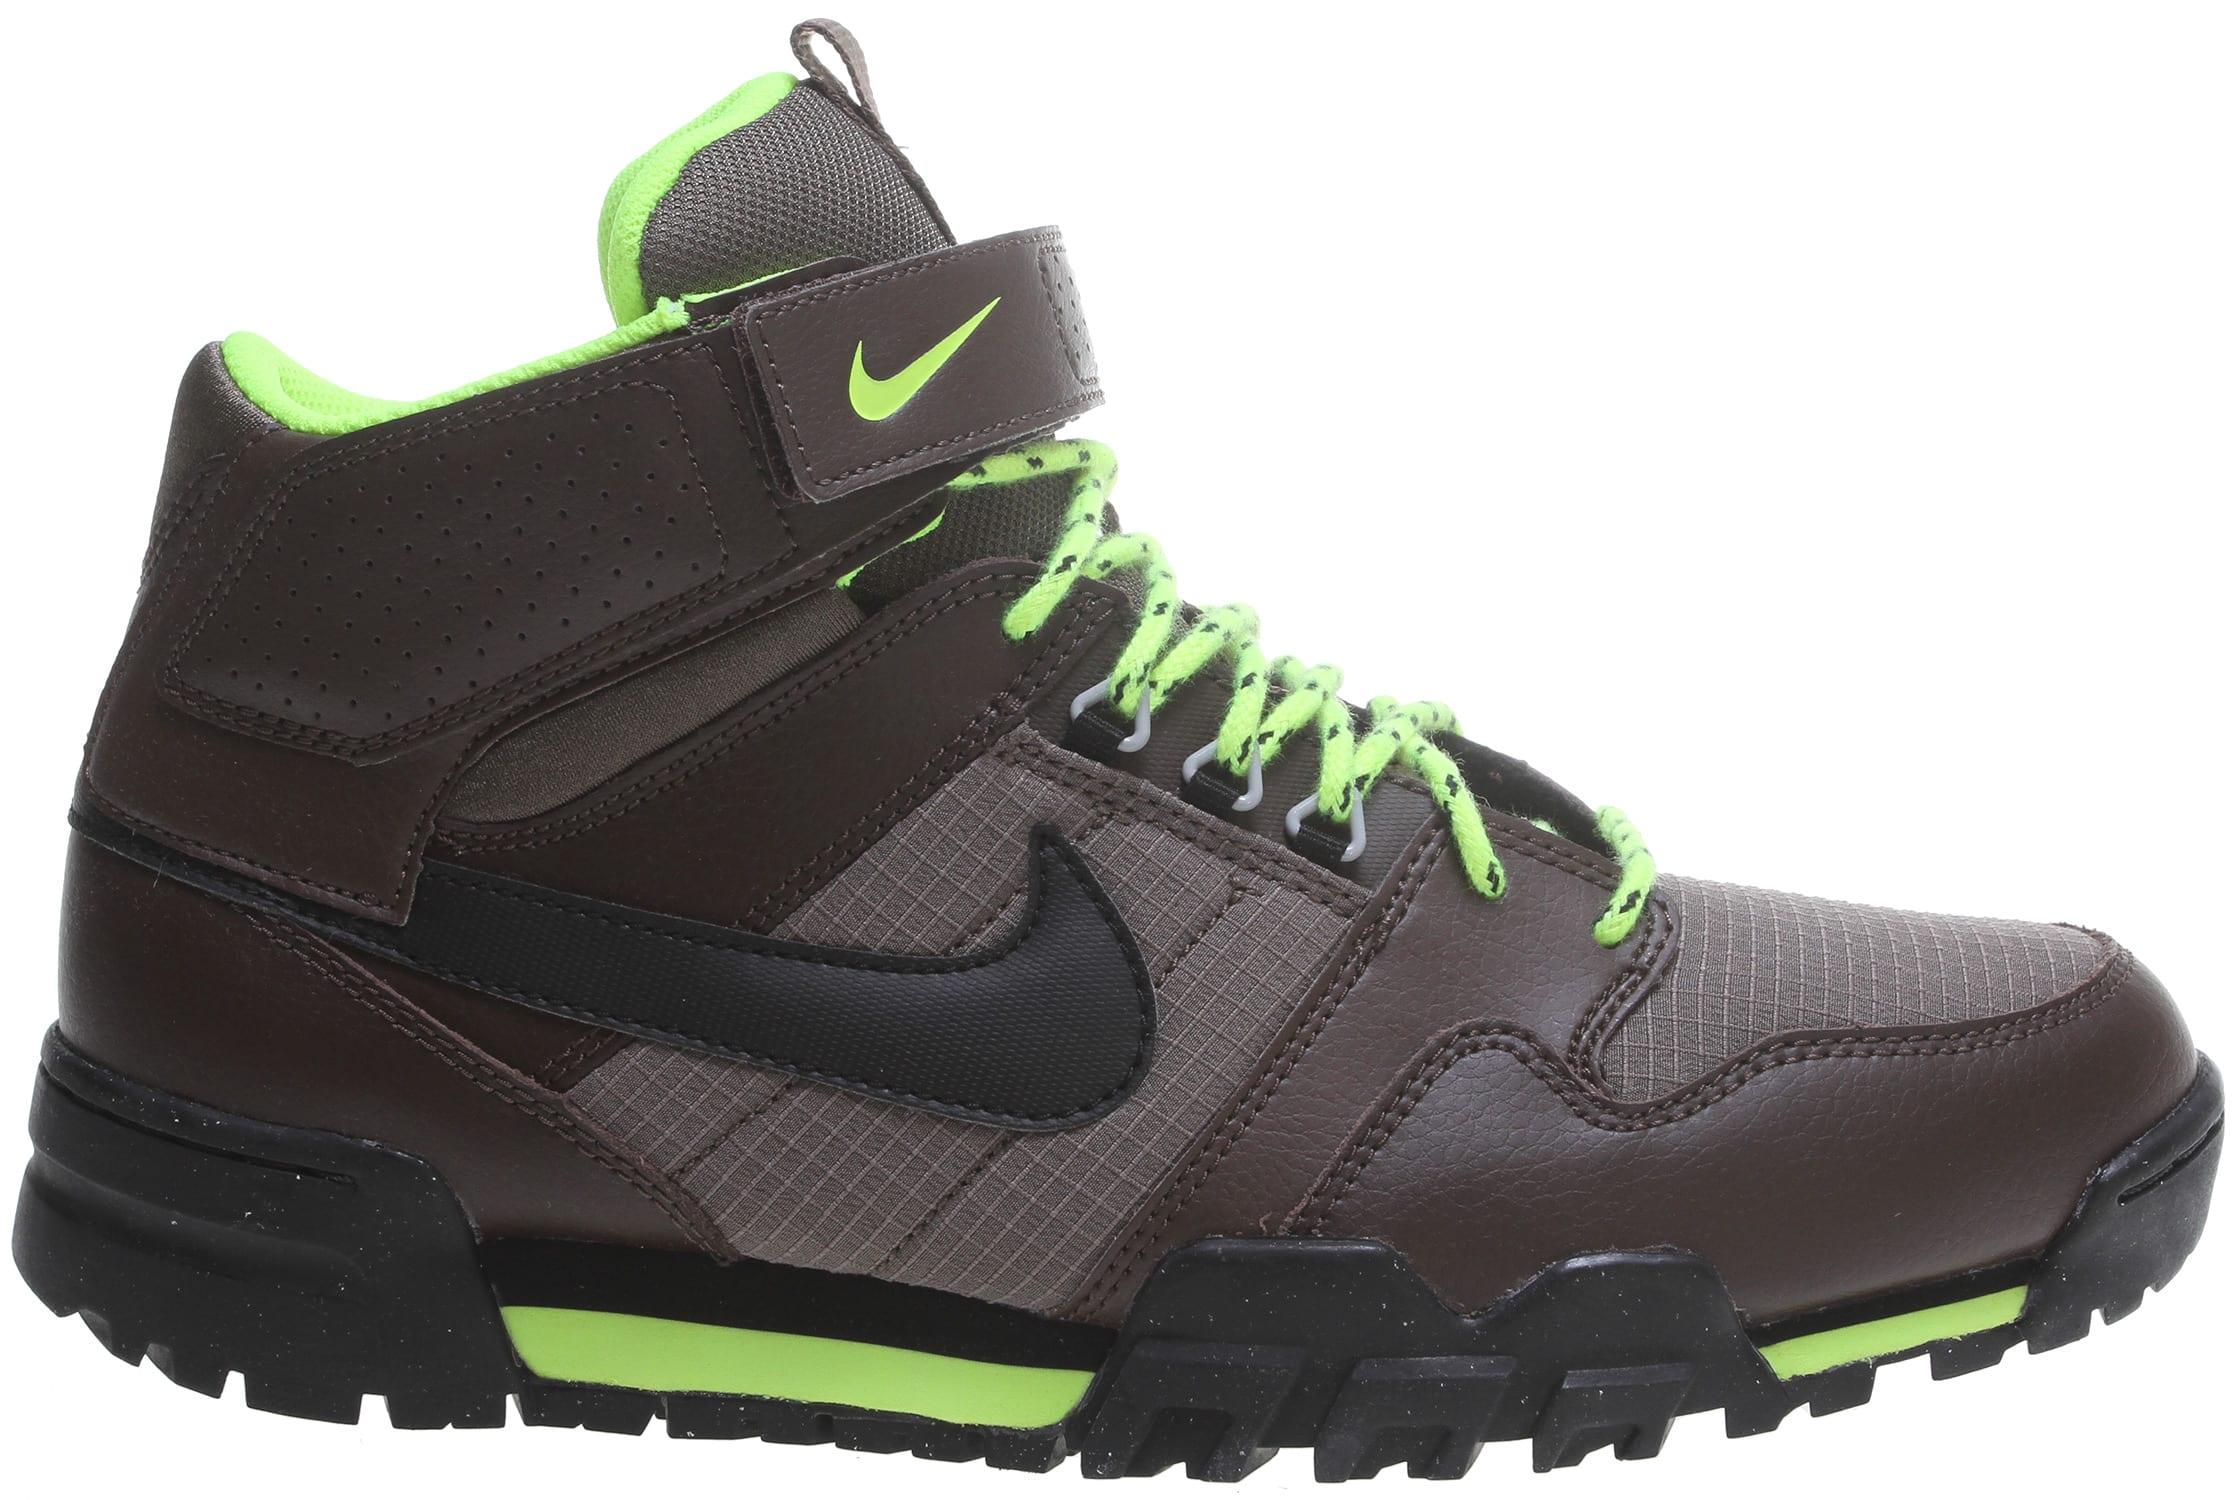 Nike Mogan Mid 2 Oms Hiking Boots - thumbnail 1